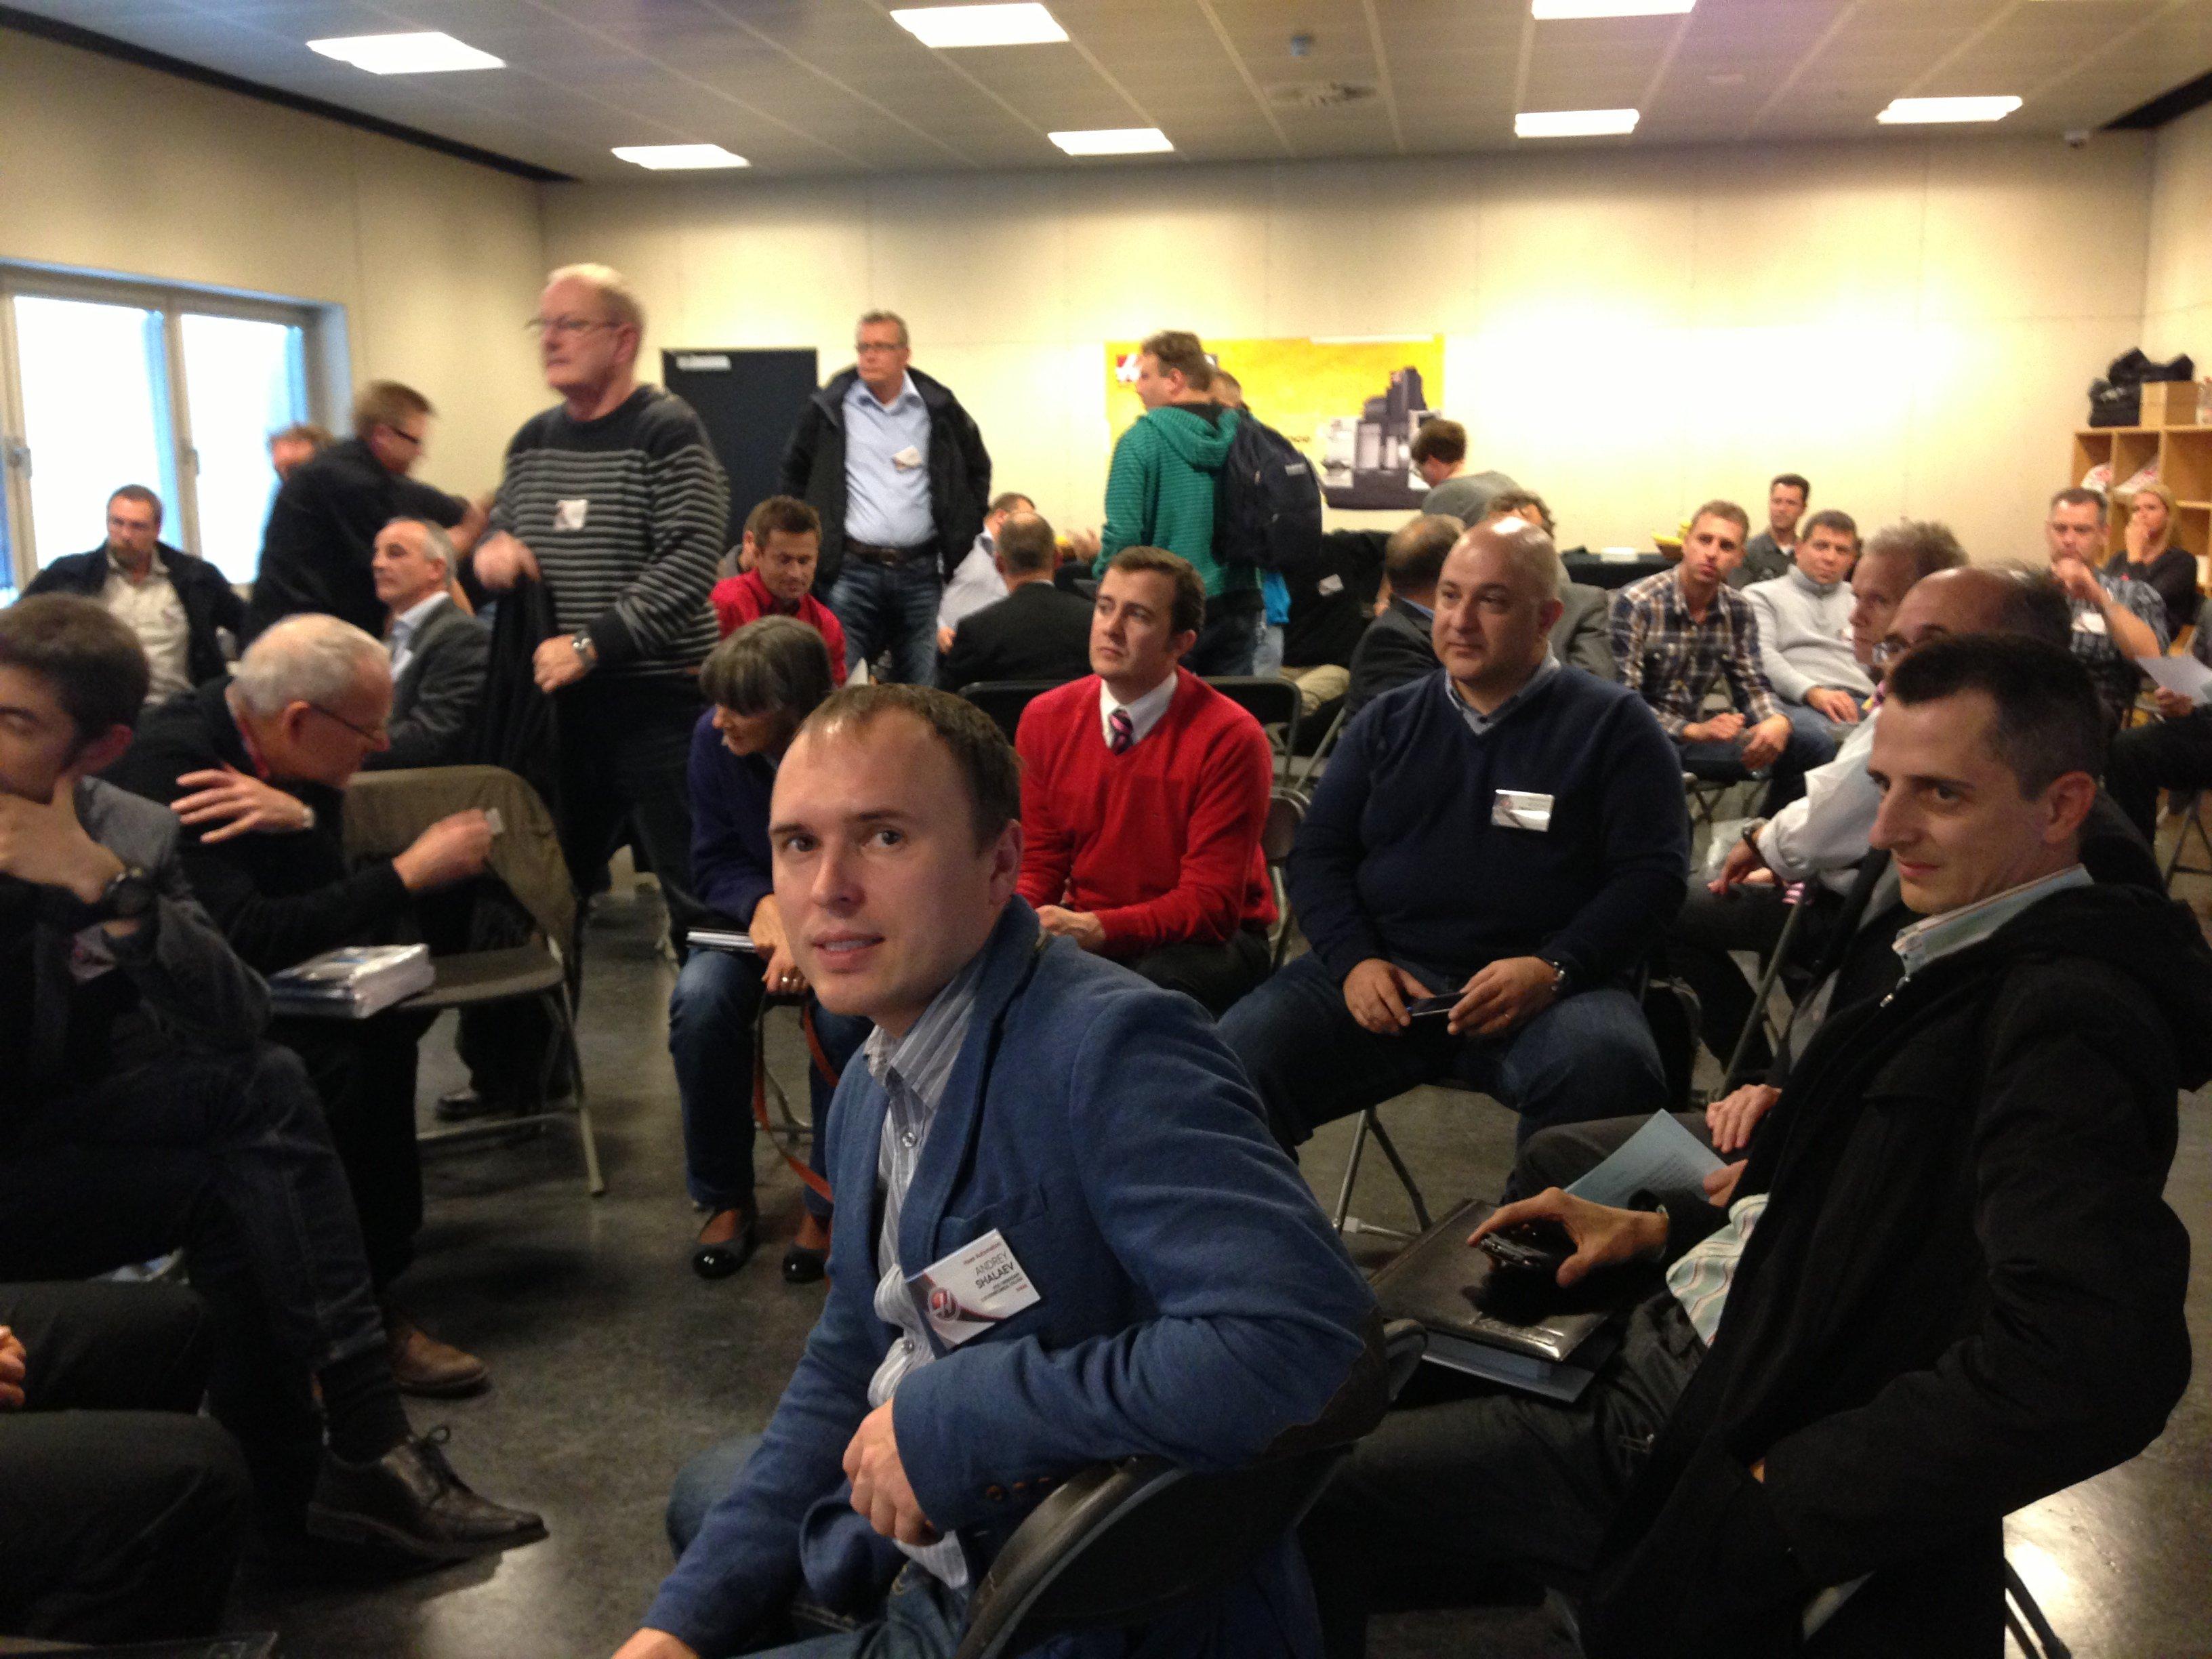 http://www.npfmetallika.com/images/upload/Конференция%20HTEC.JPG